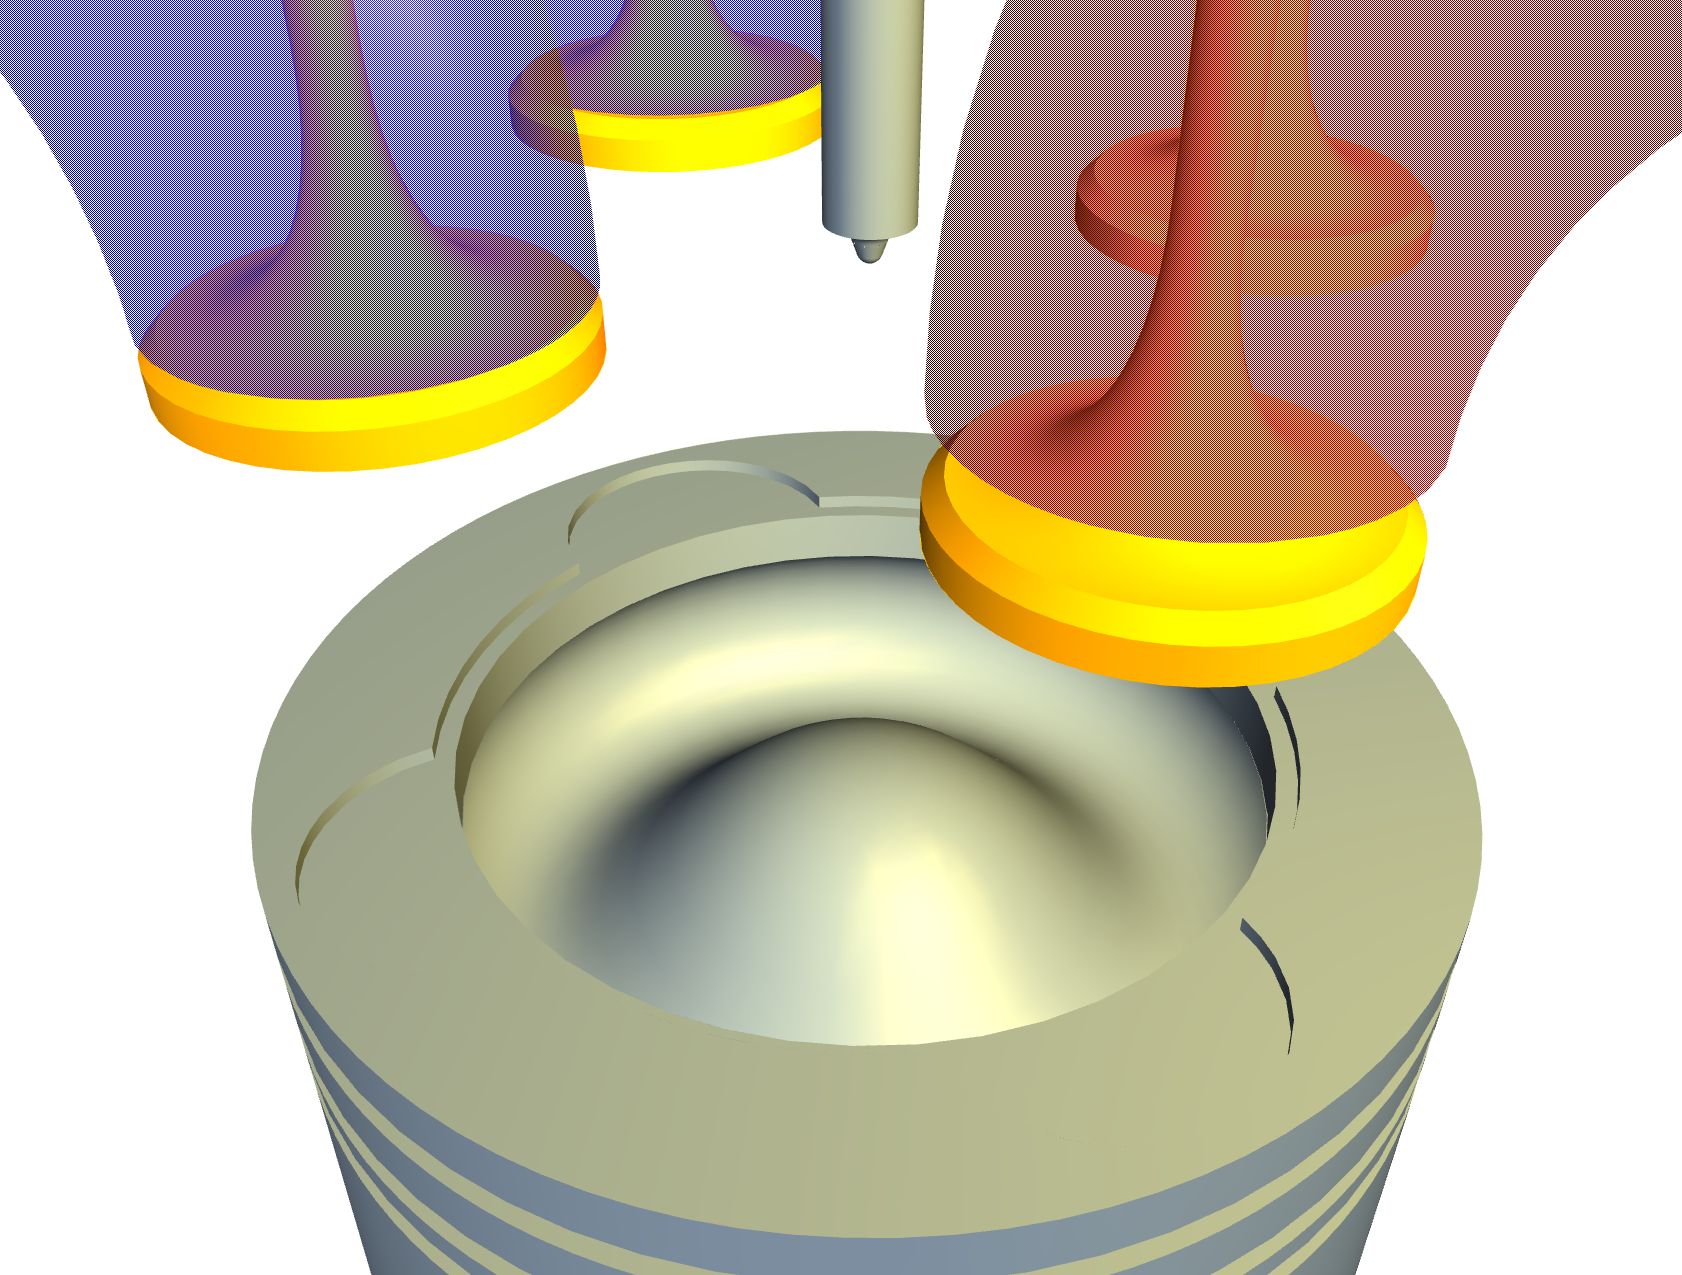 Design of a Simple Piston Bowl